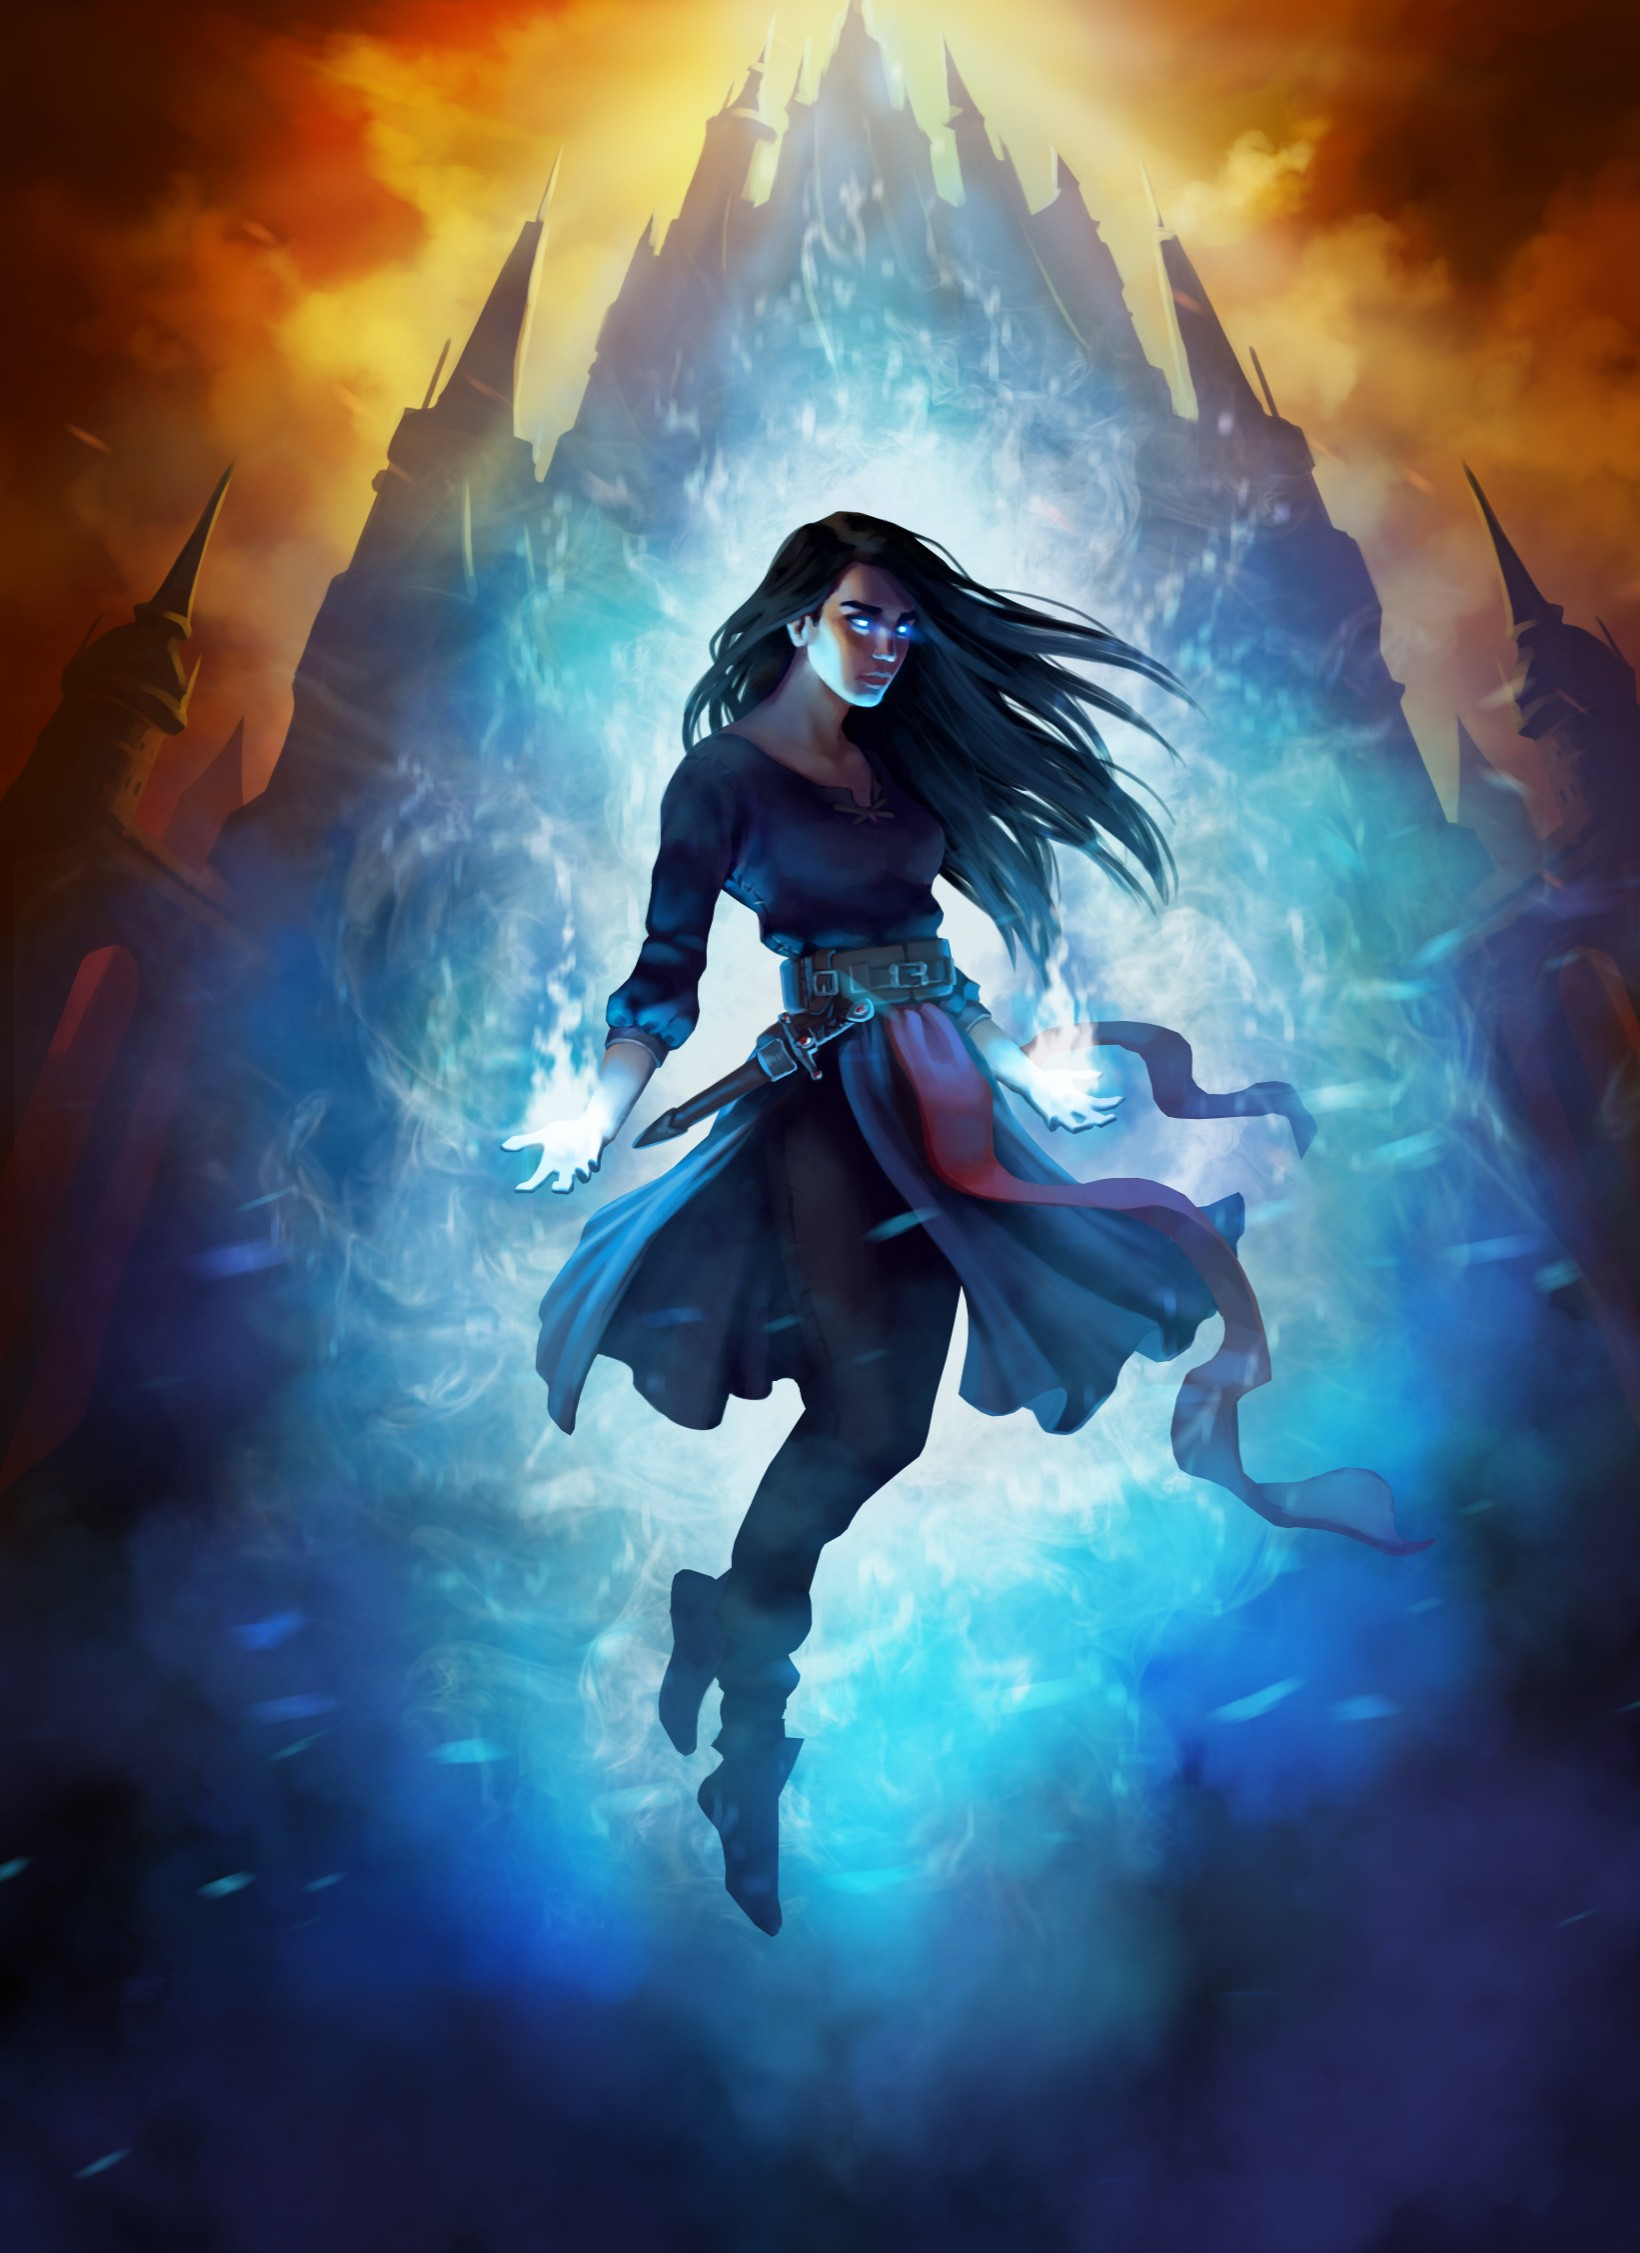 True Sorcery A Revised Sorcerer For 5e Gm Binder I did a divine soul sorcerer and they make excellent support. true sorcery a revised sorcerer for